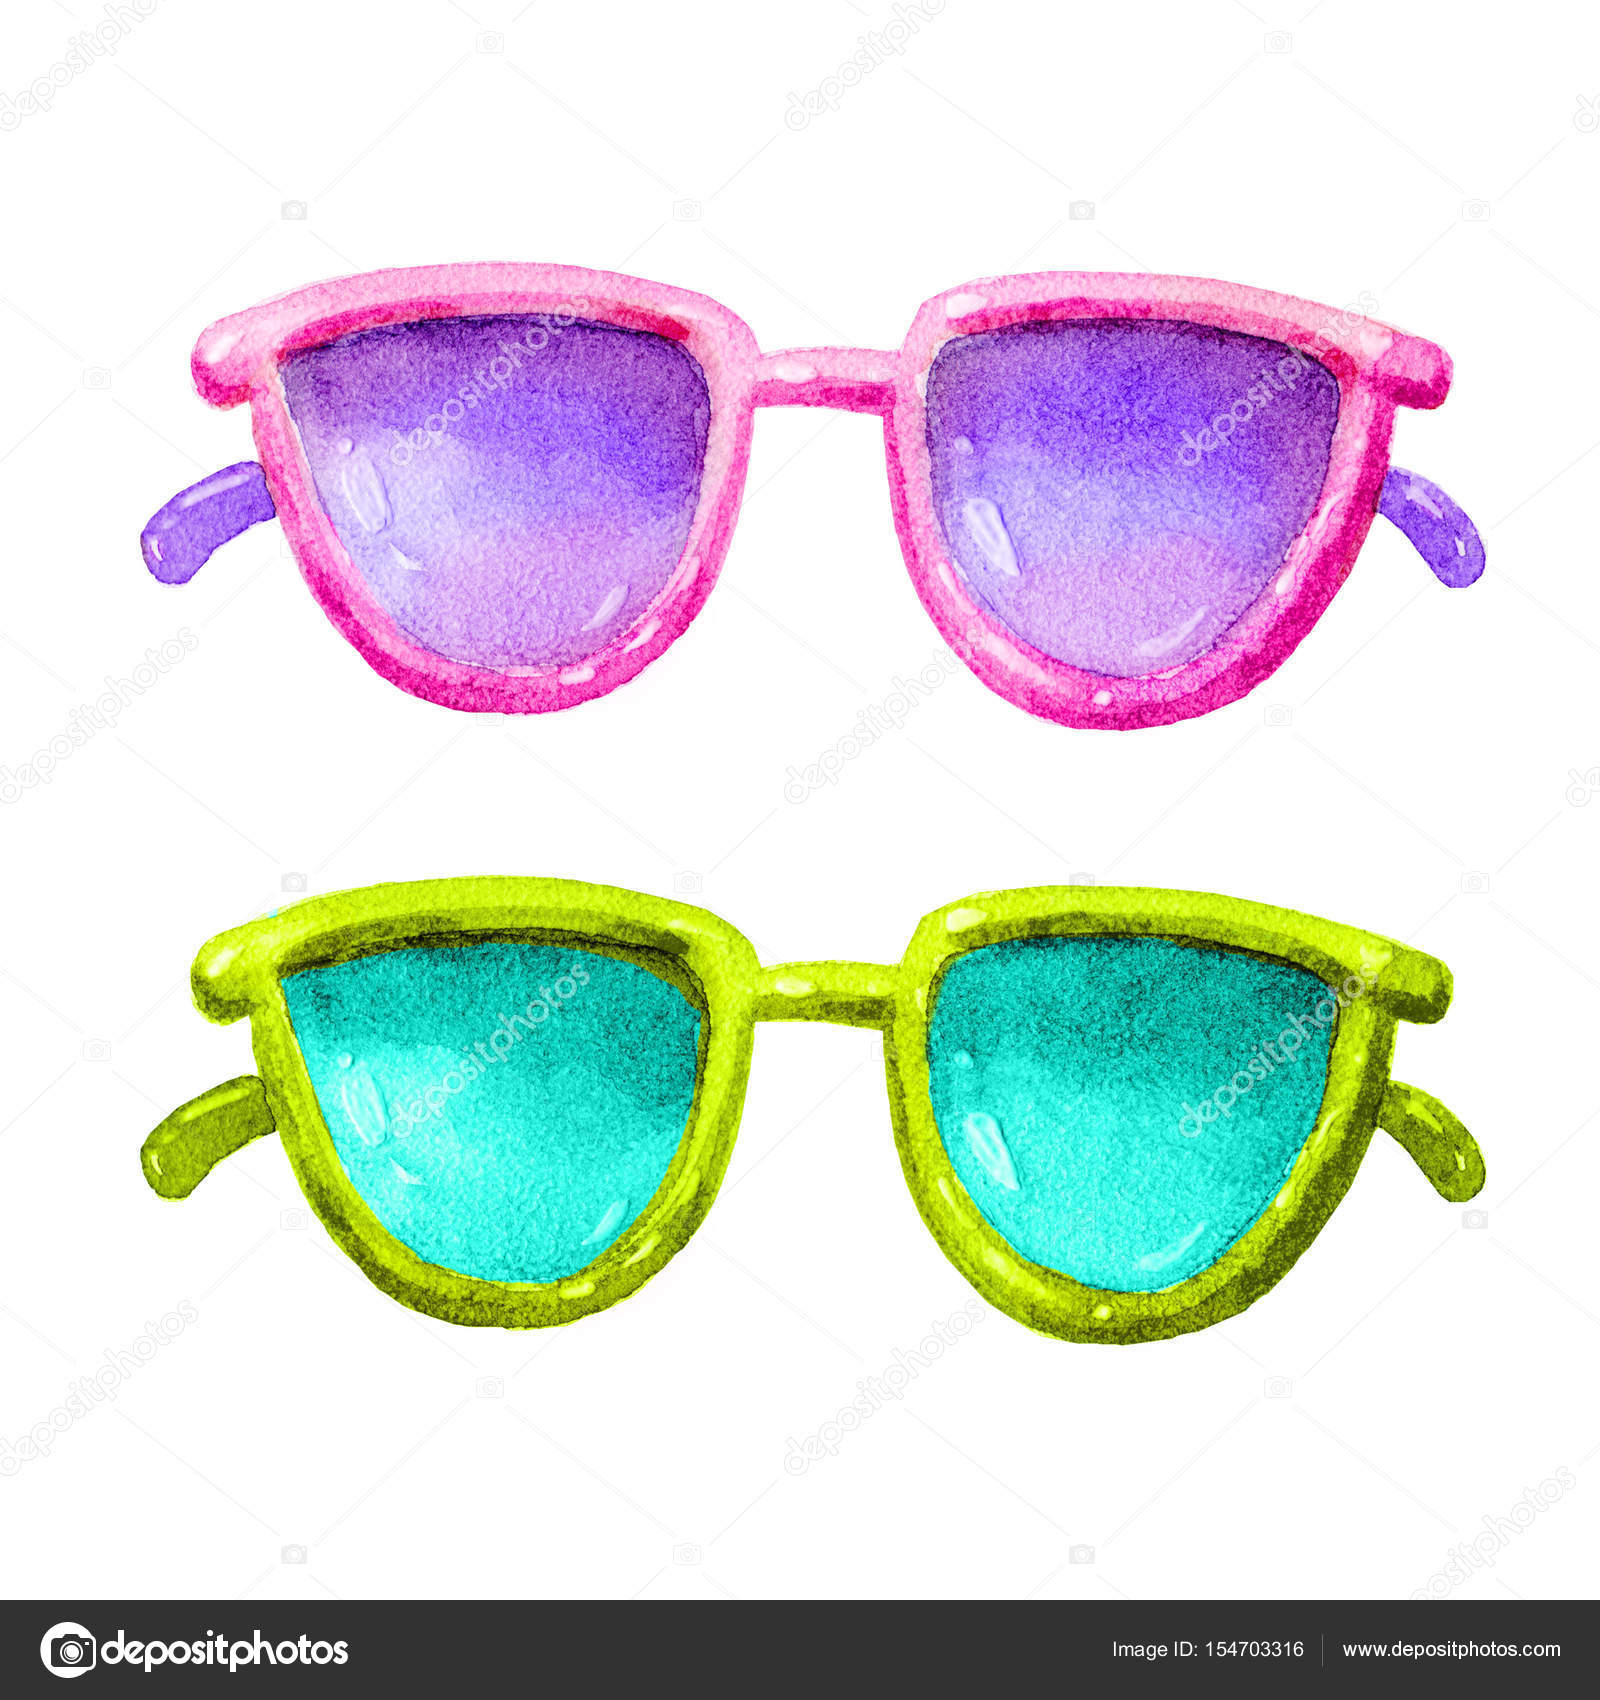 527b84cb307 Cute watercolor Glasses colorful set illustration. Glasses icon set  isolated. Glasses summer symbol. Glasses set for traveling design.– stock  image